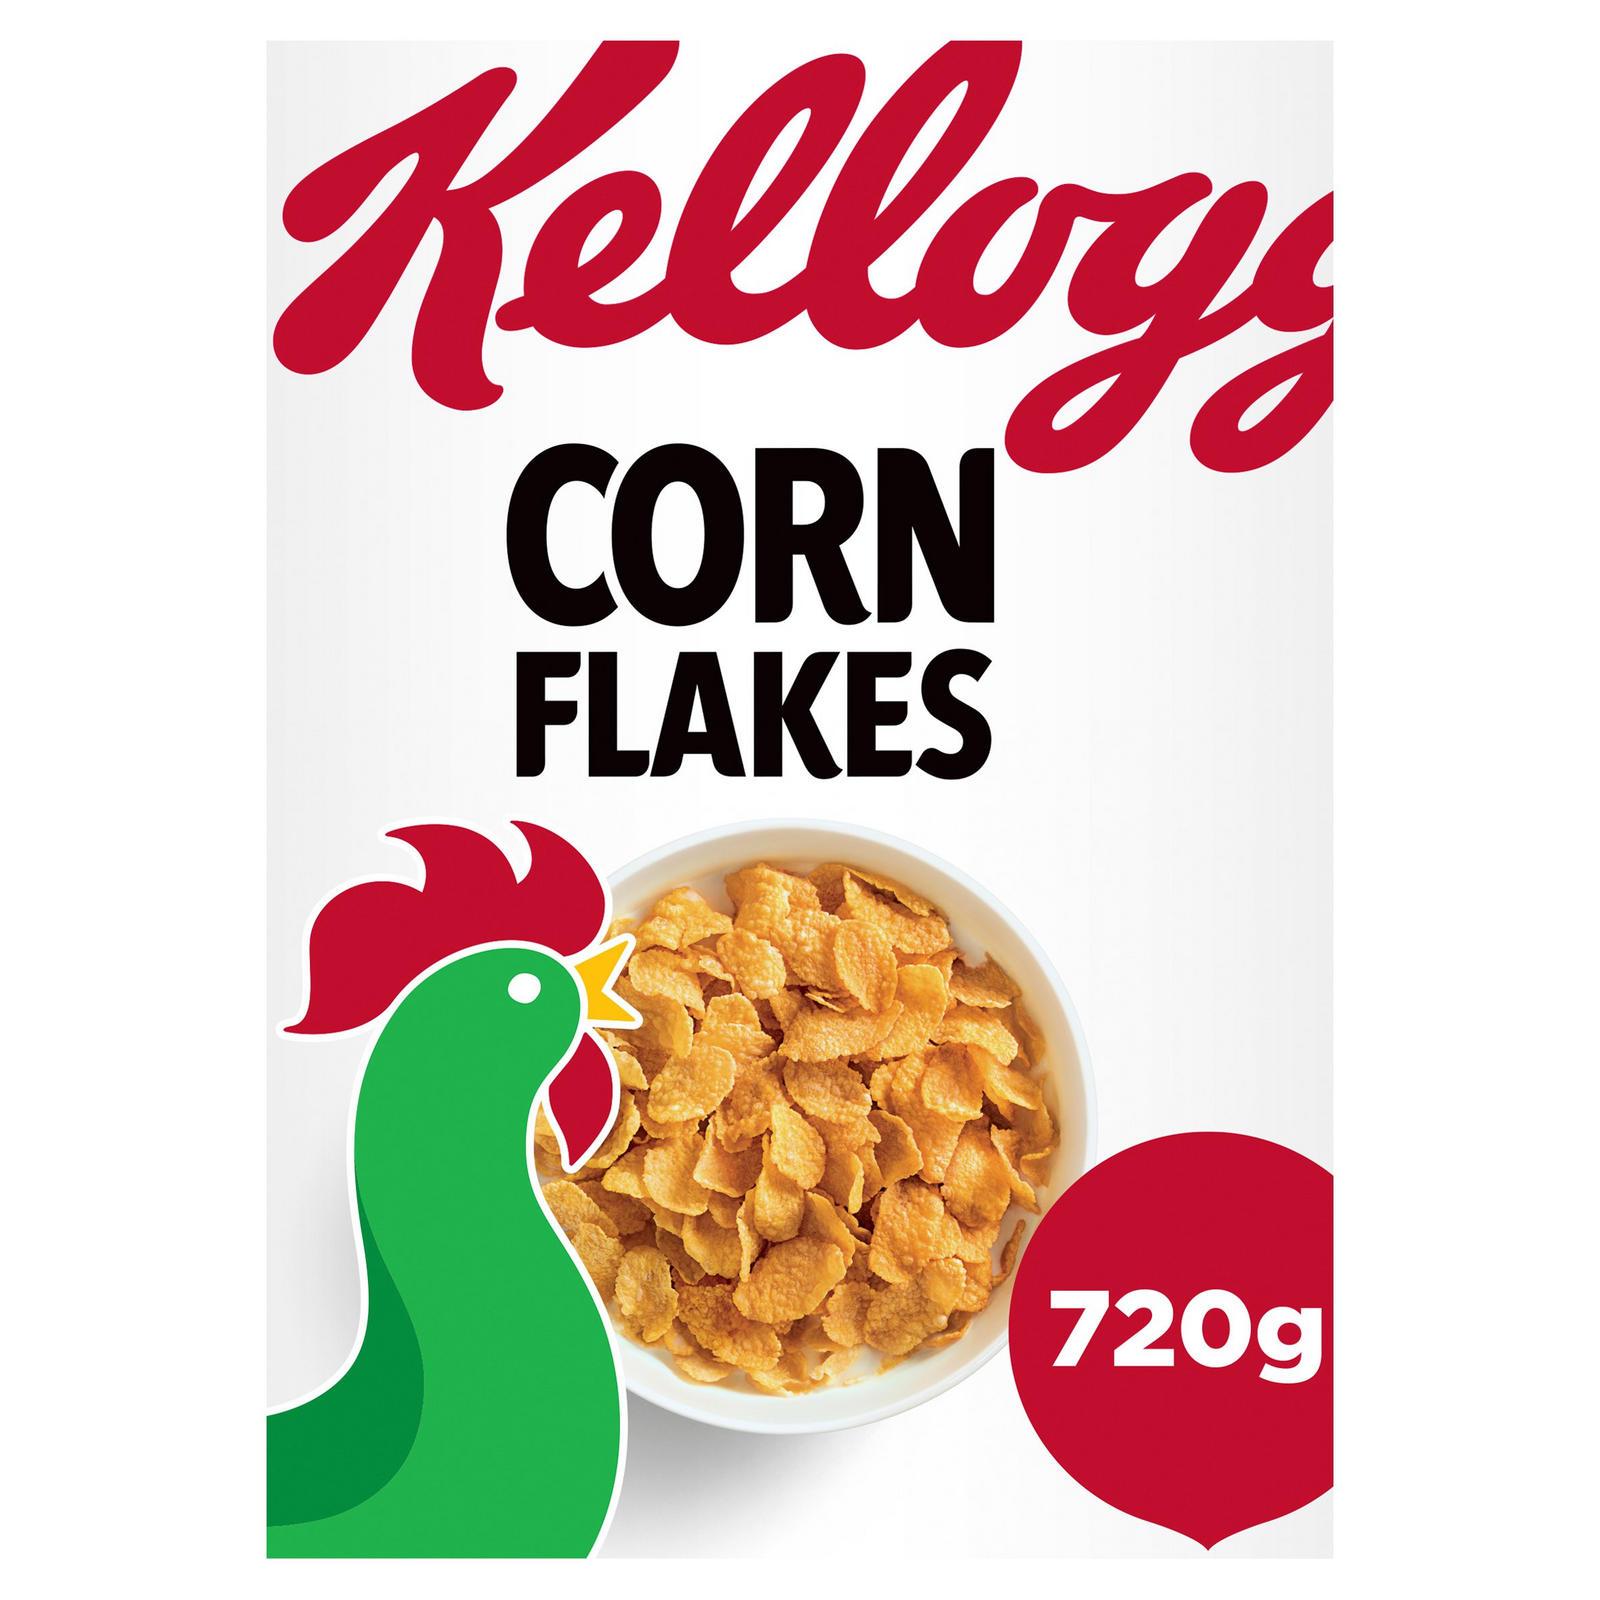 Kellogg's Corn Flakes Cereal 720g